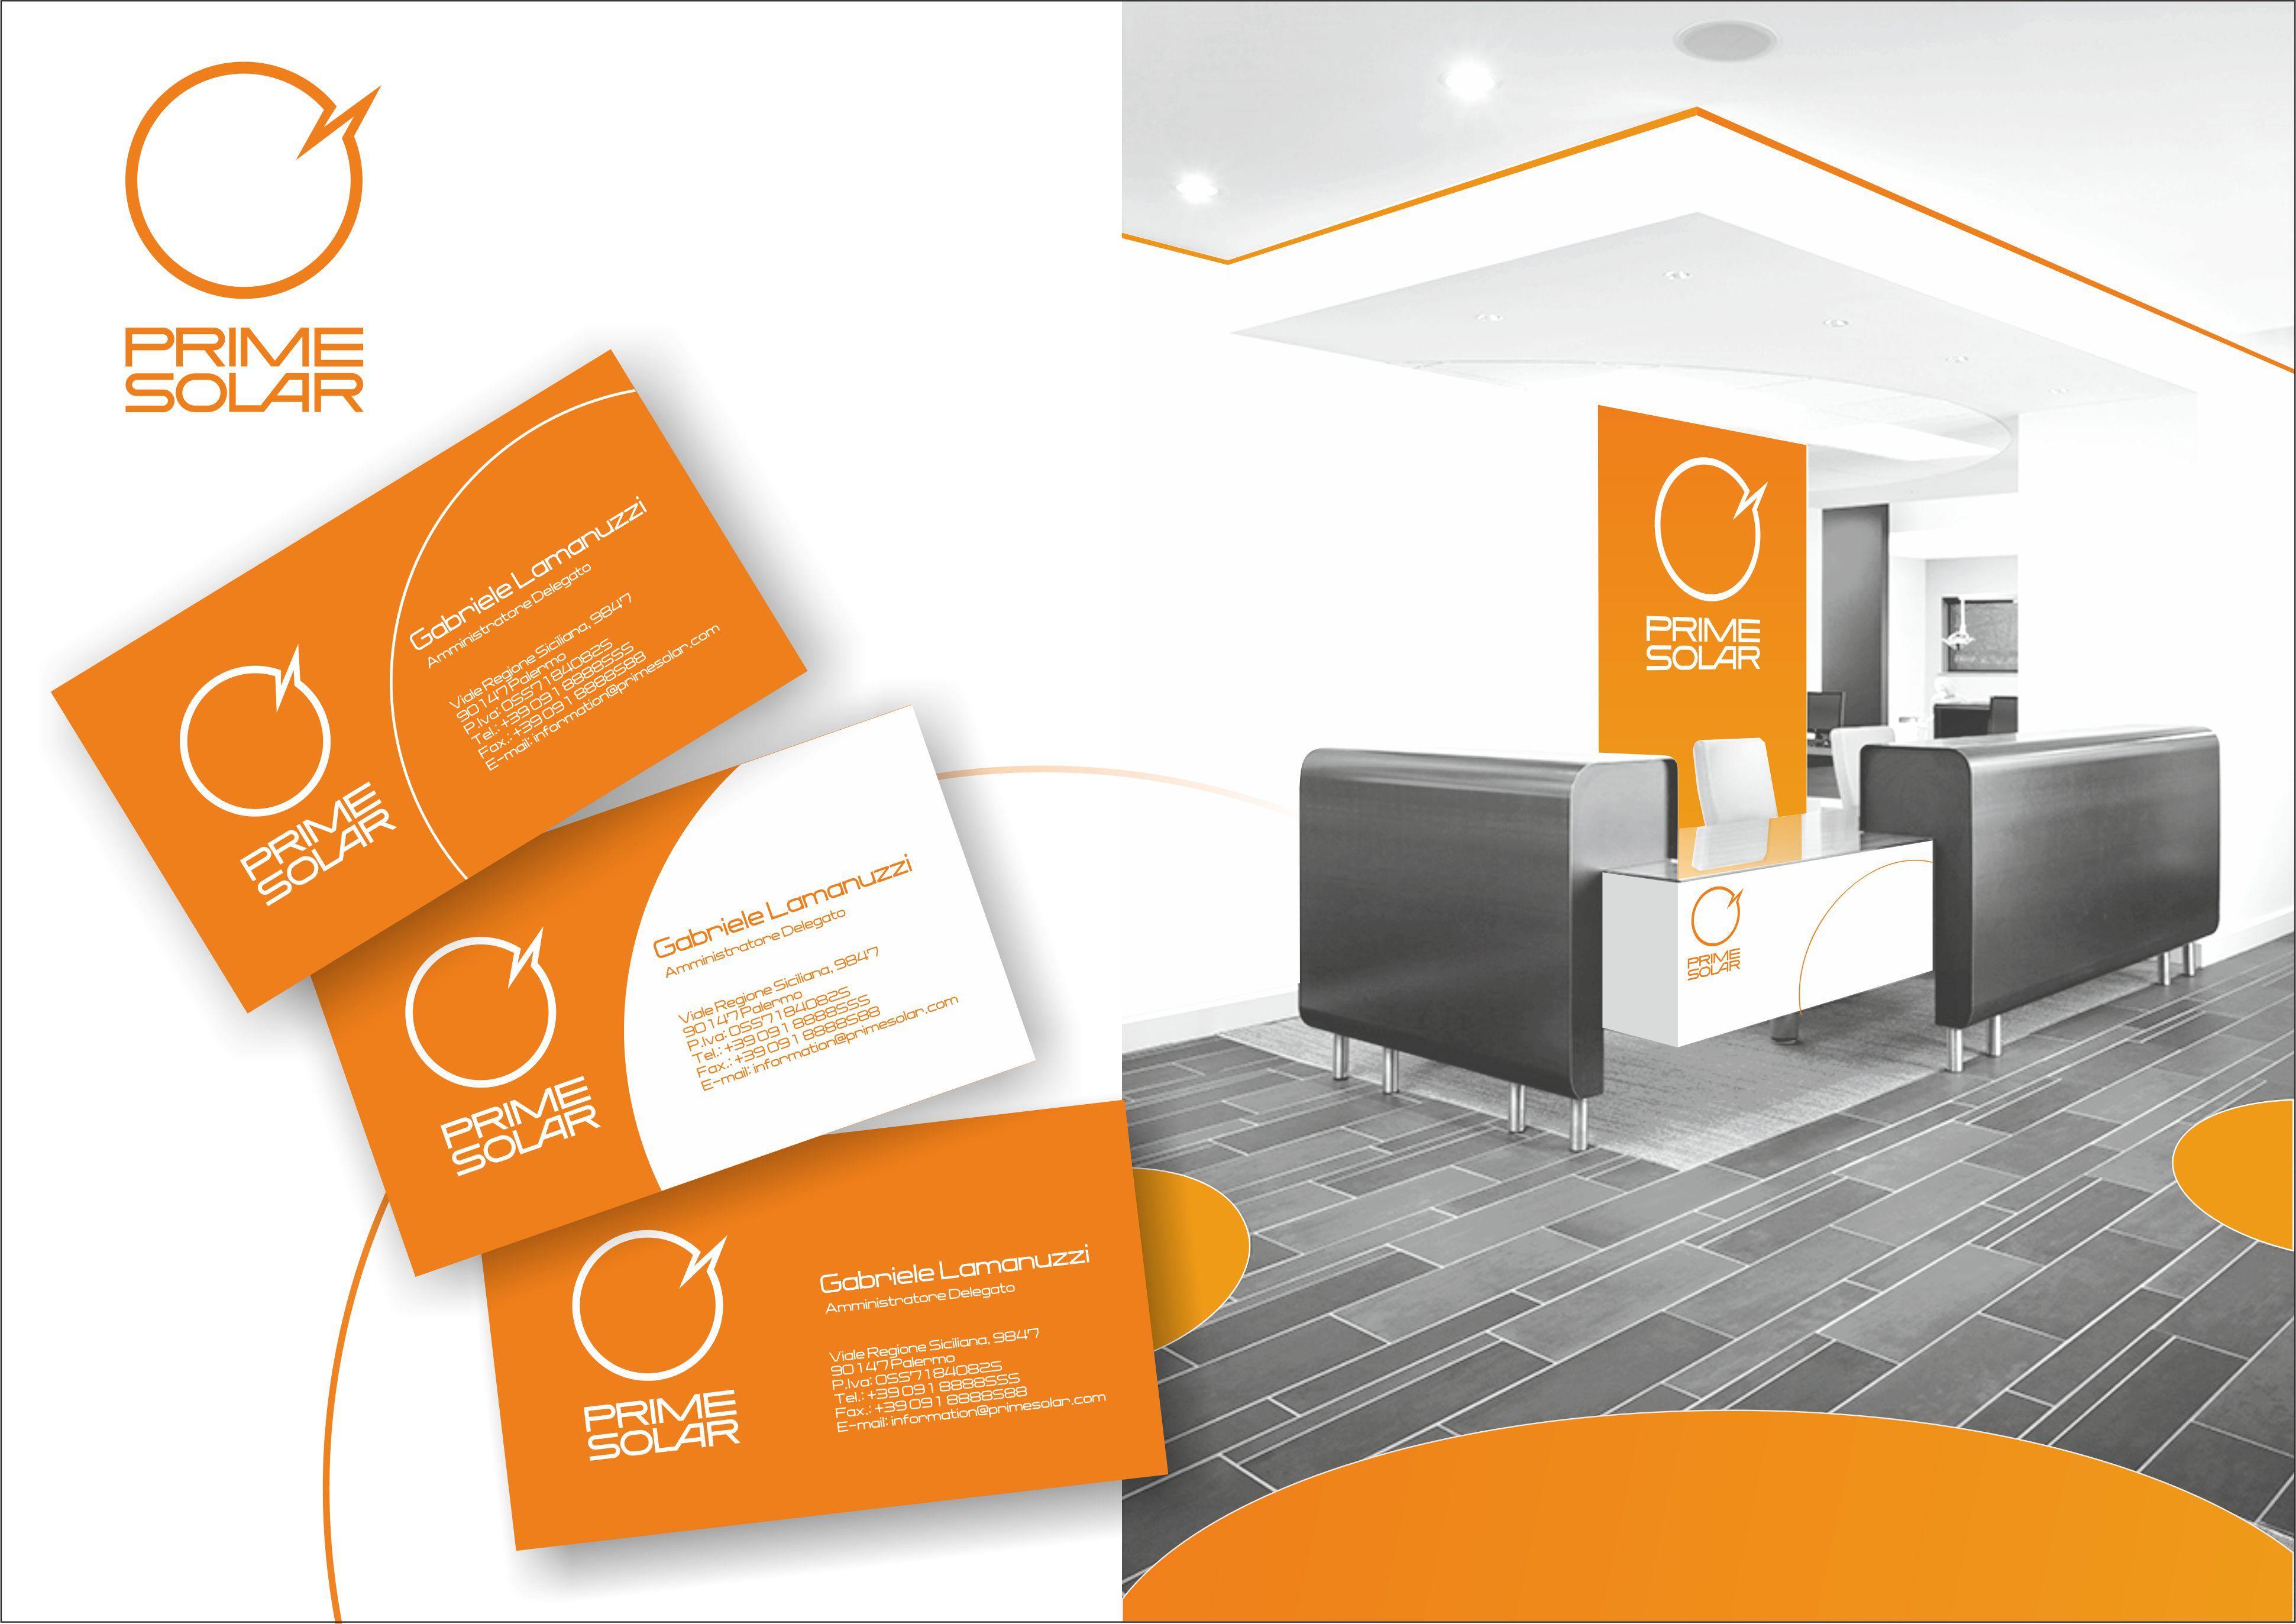 Логотип компании PrimeSolar [UPD: 16:45 15/12/11] фото f_4ef276a8188d9.jpg